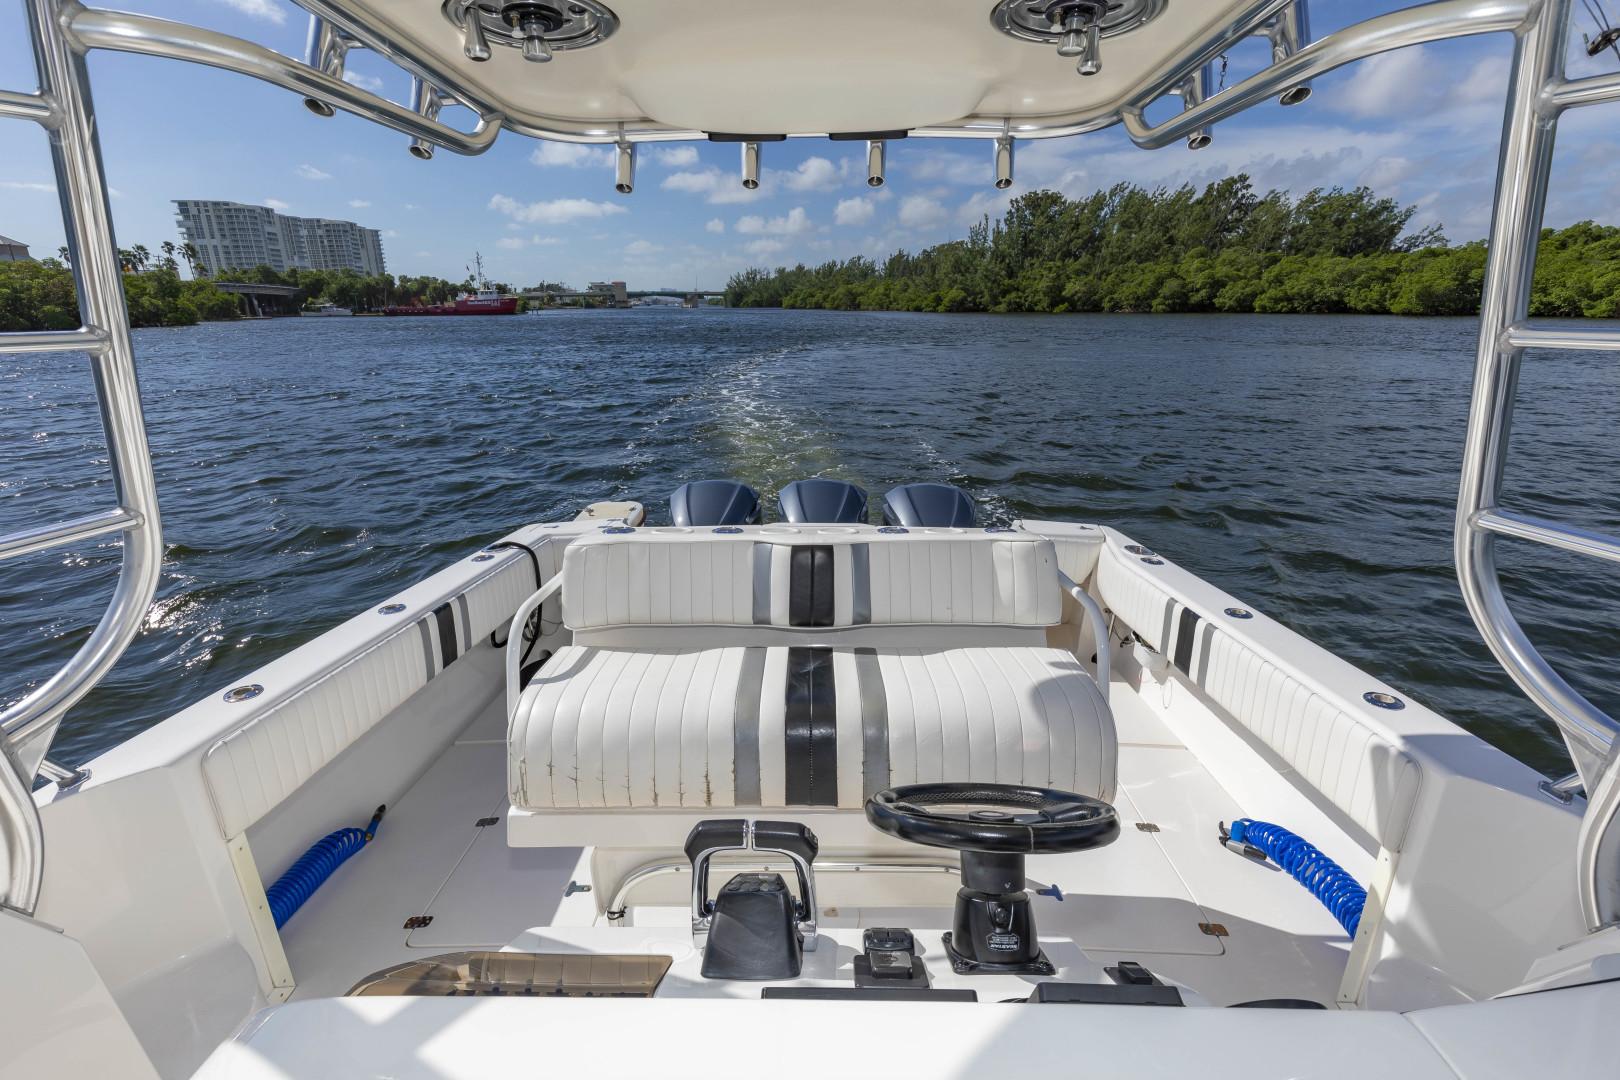 Intrepid-377 Walkaround 2005-Rock Boat REFIT 2018 Dania Beach-Florida-United States-377 Intrepid Helm 4-1511547 | Thumbnail